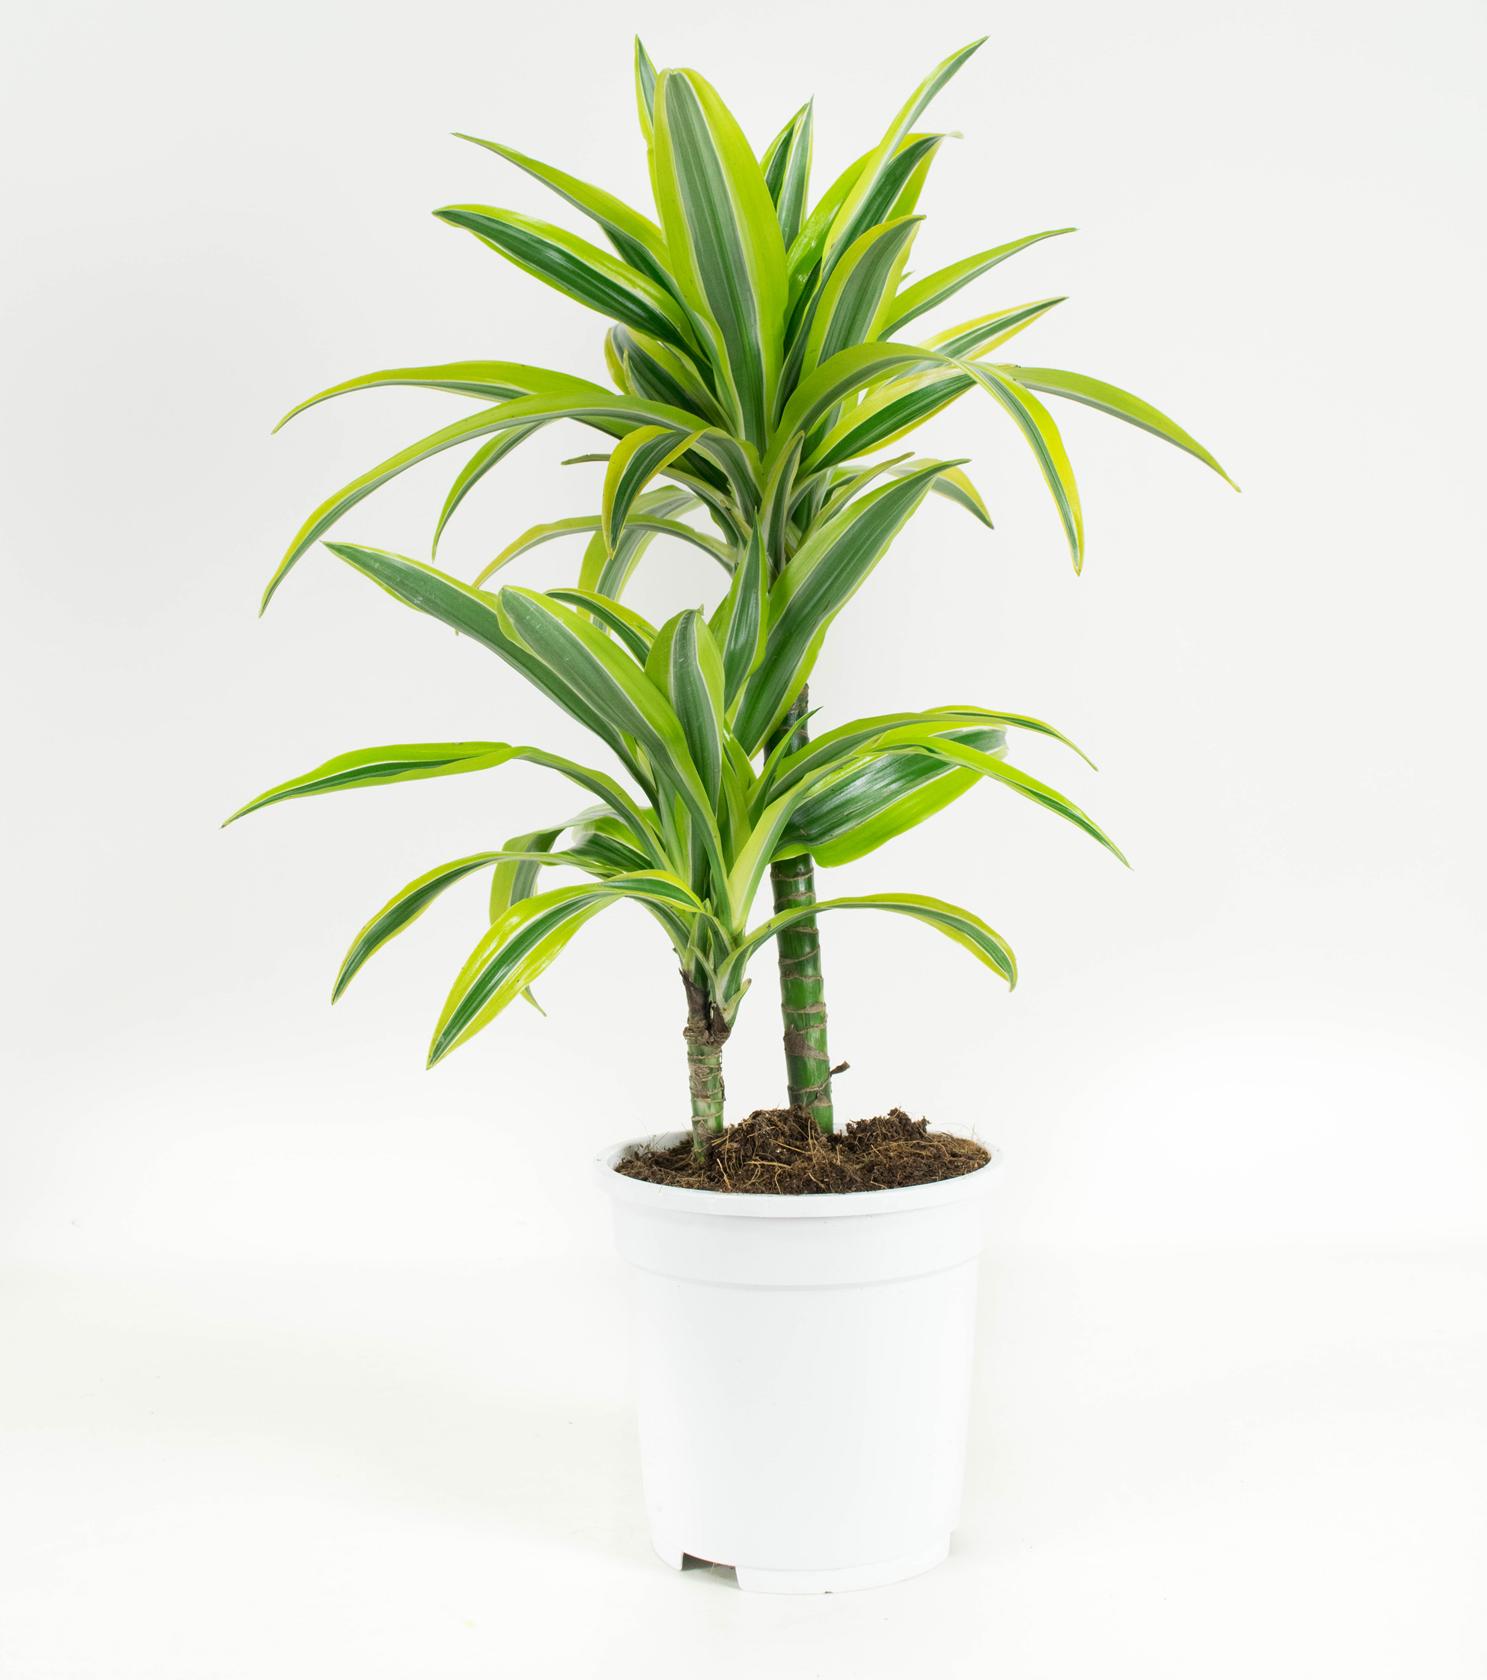 2 stuks Drakenbloedboom - Dracaena fagans dermensis lemon lime 65cm hoog